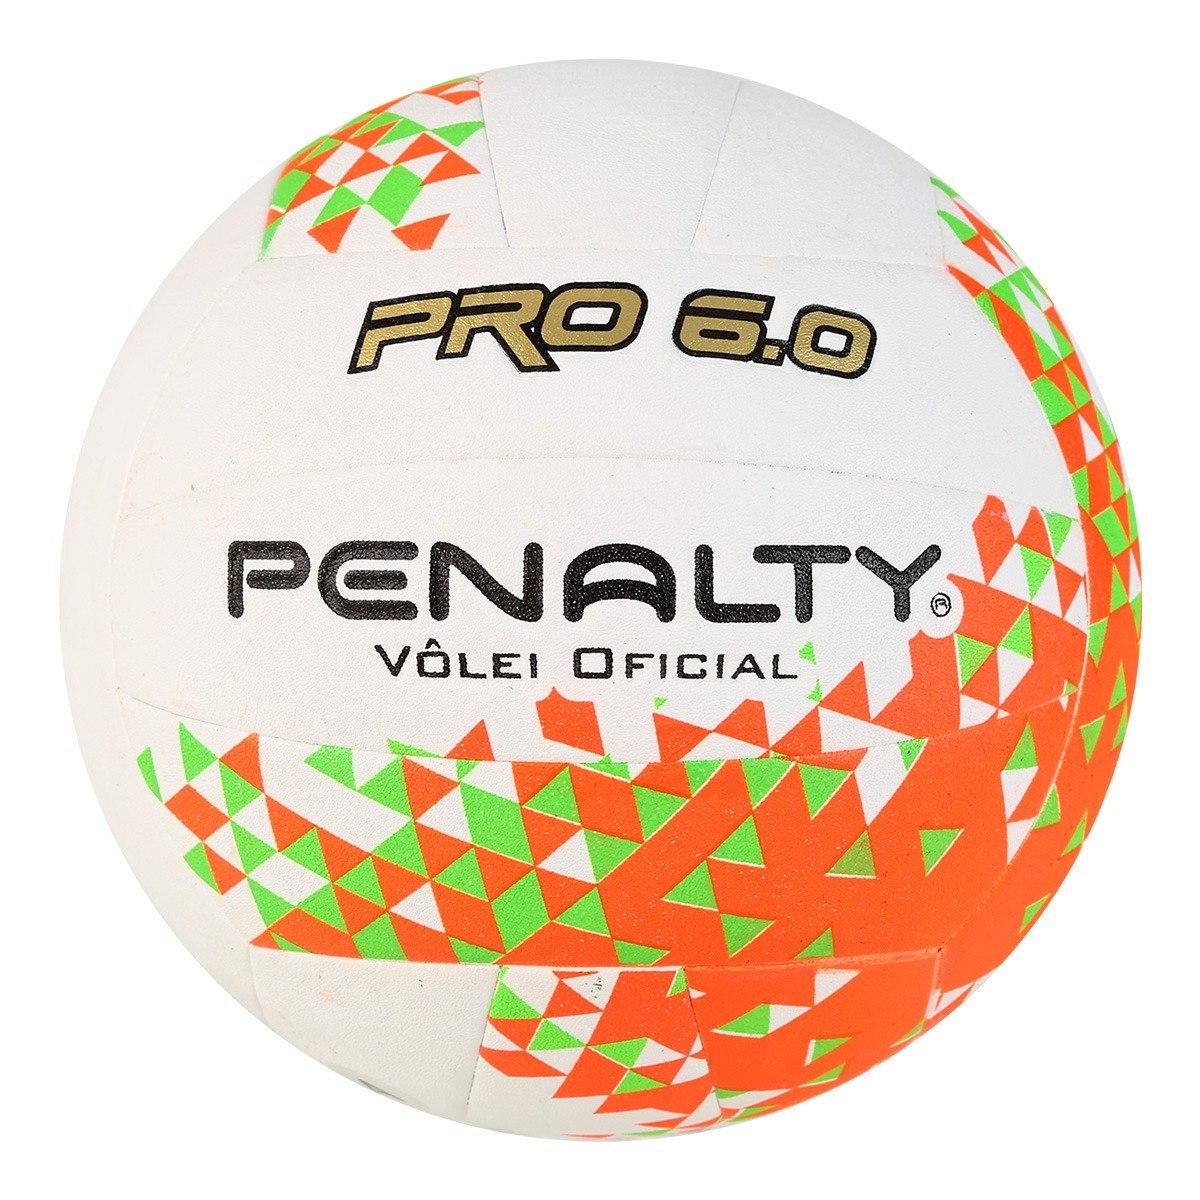 bola de vôlei penalty 6.0 pro viii. Carregando zoom. 498a2395c1798